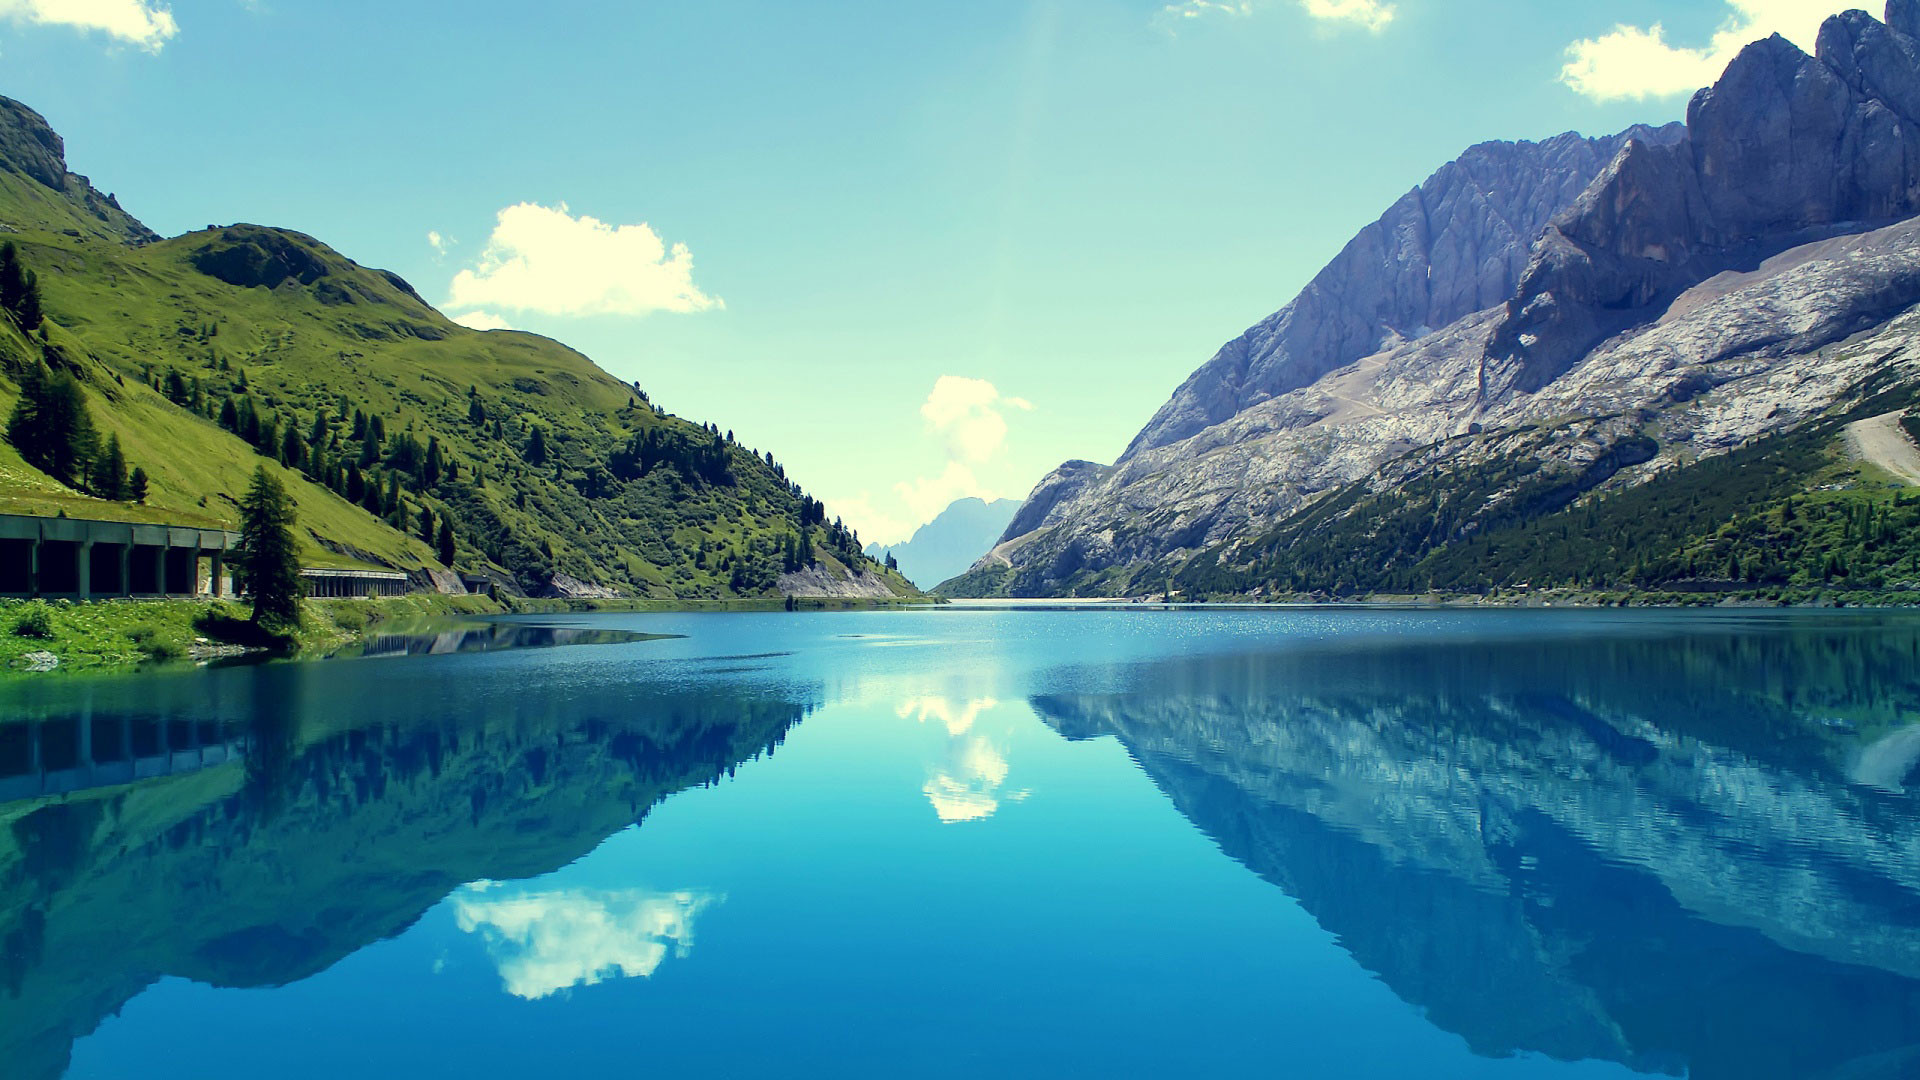 hd pics photos nature best river mountain landscape scenery desktop  background wallpaper